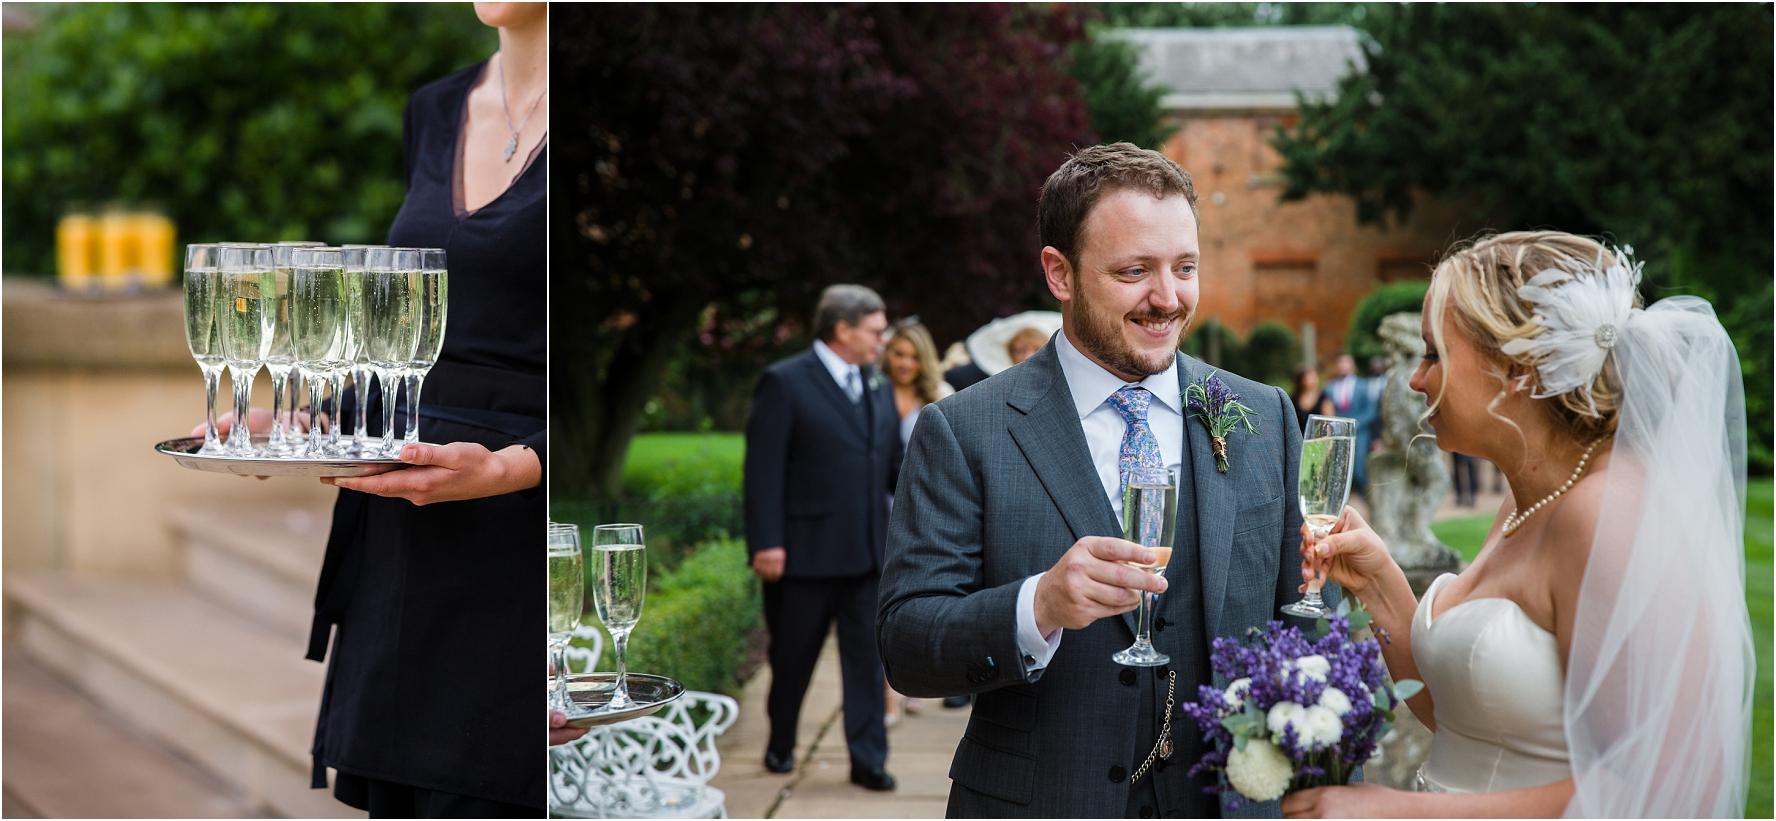 wedding-photography-the-orangery-settringham_0447